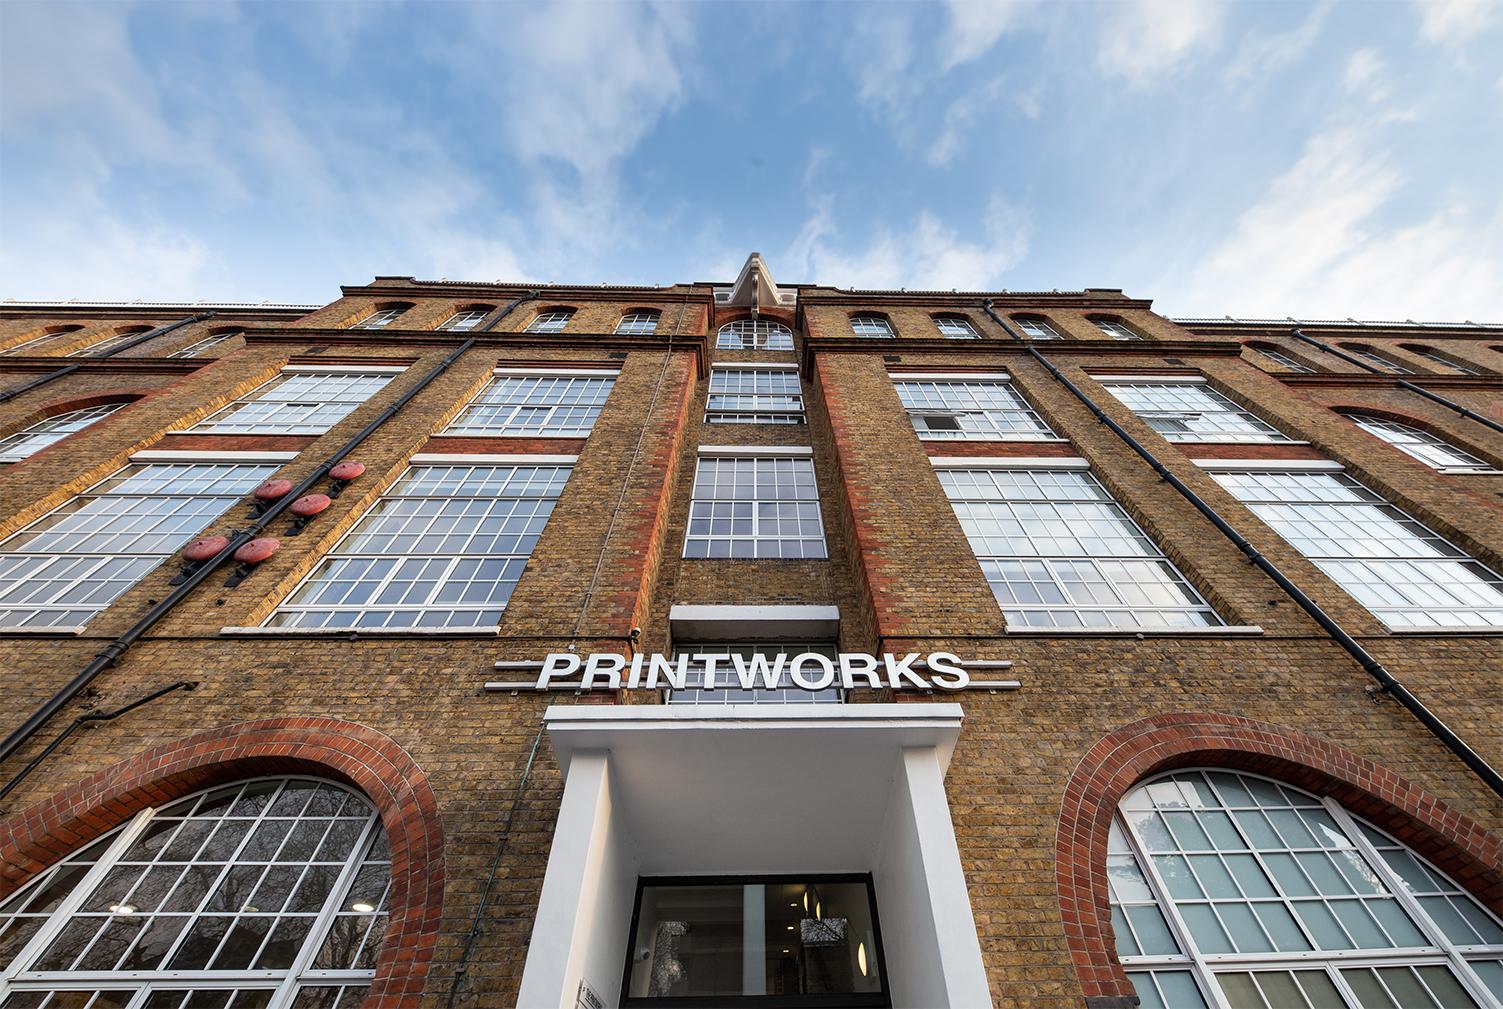 The Printworks, 139 Clapham Road, London